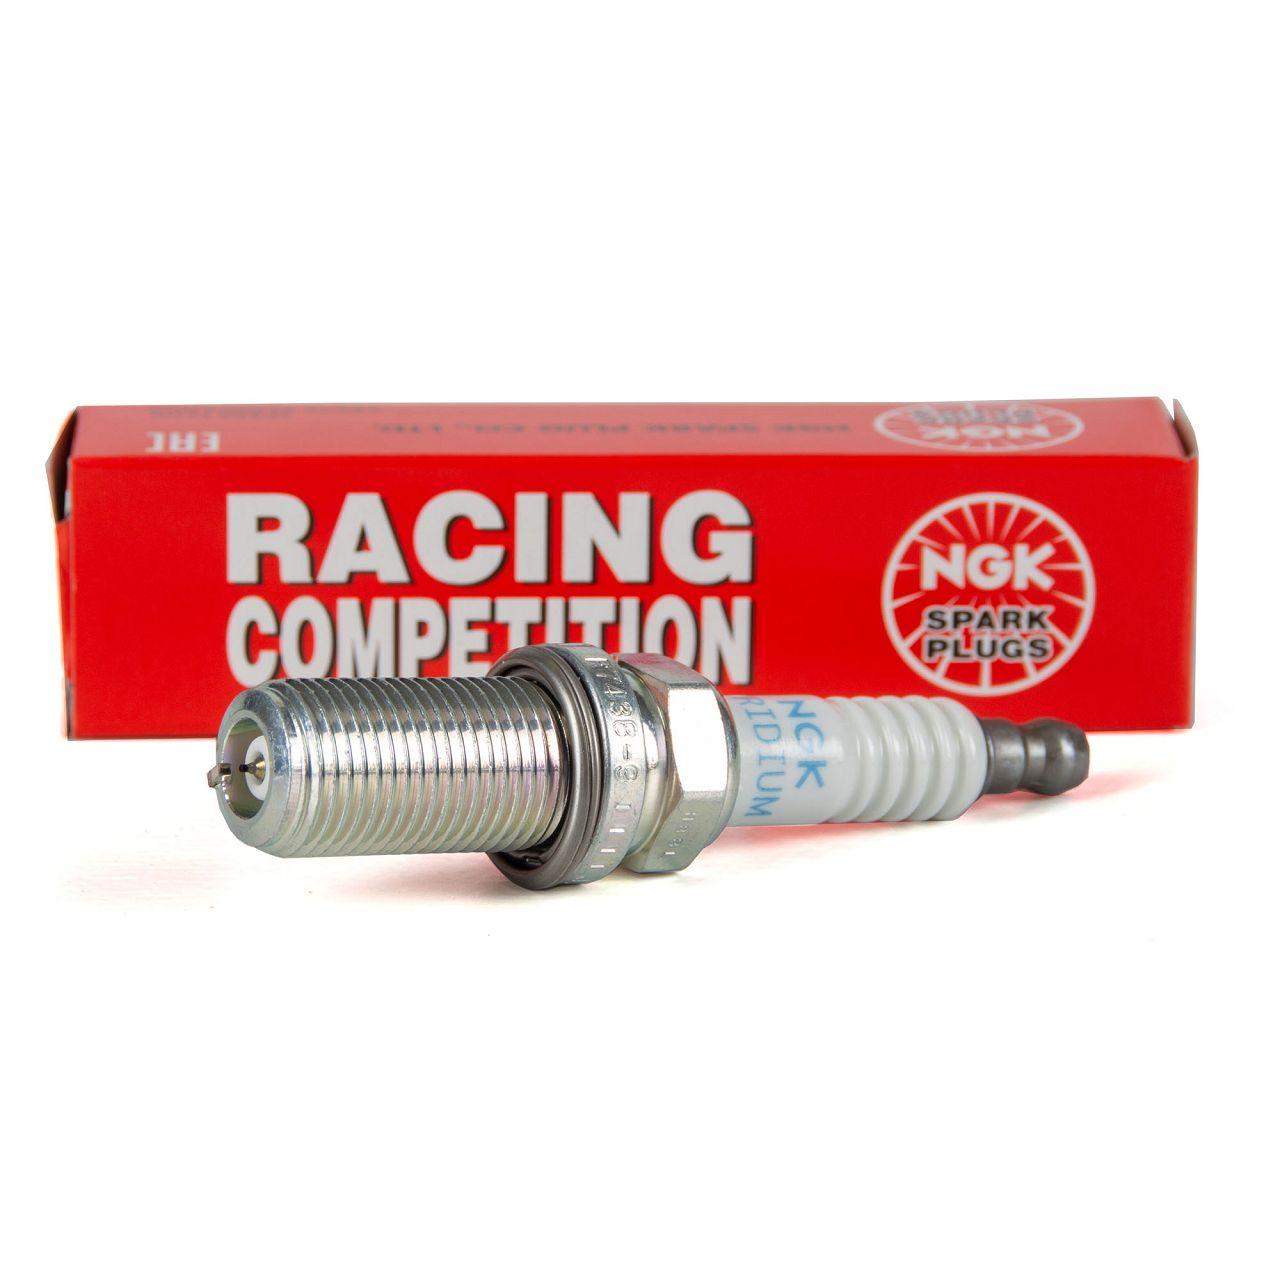 NGK Racing Zündkerze 4656 R7438-9 für AUDI TT RS RS3 2.5 TFSI